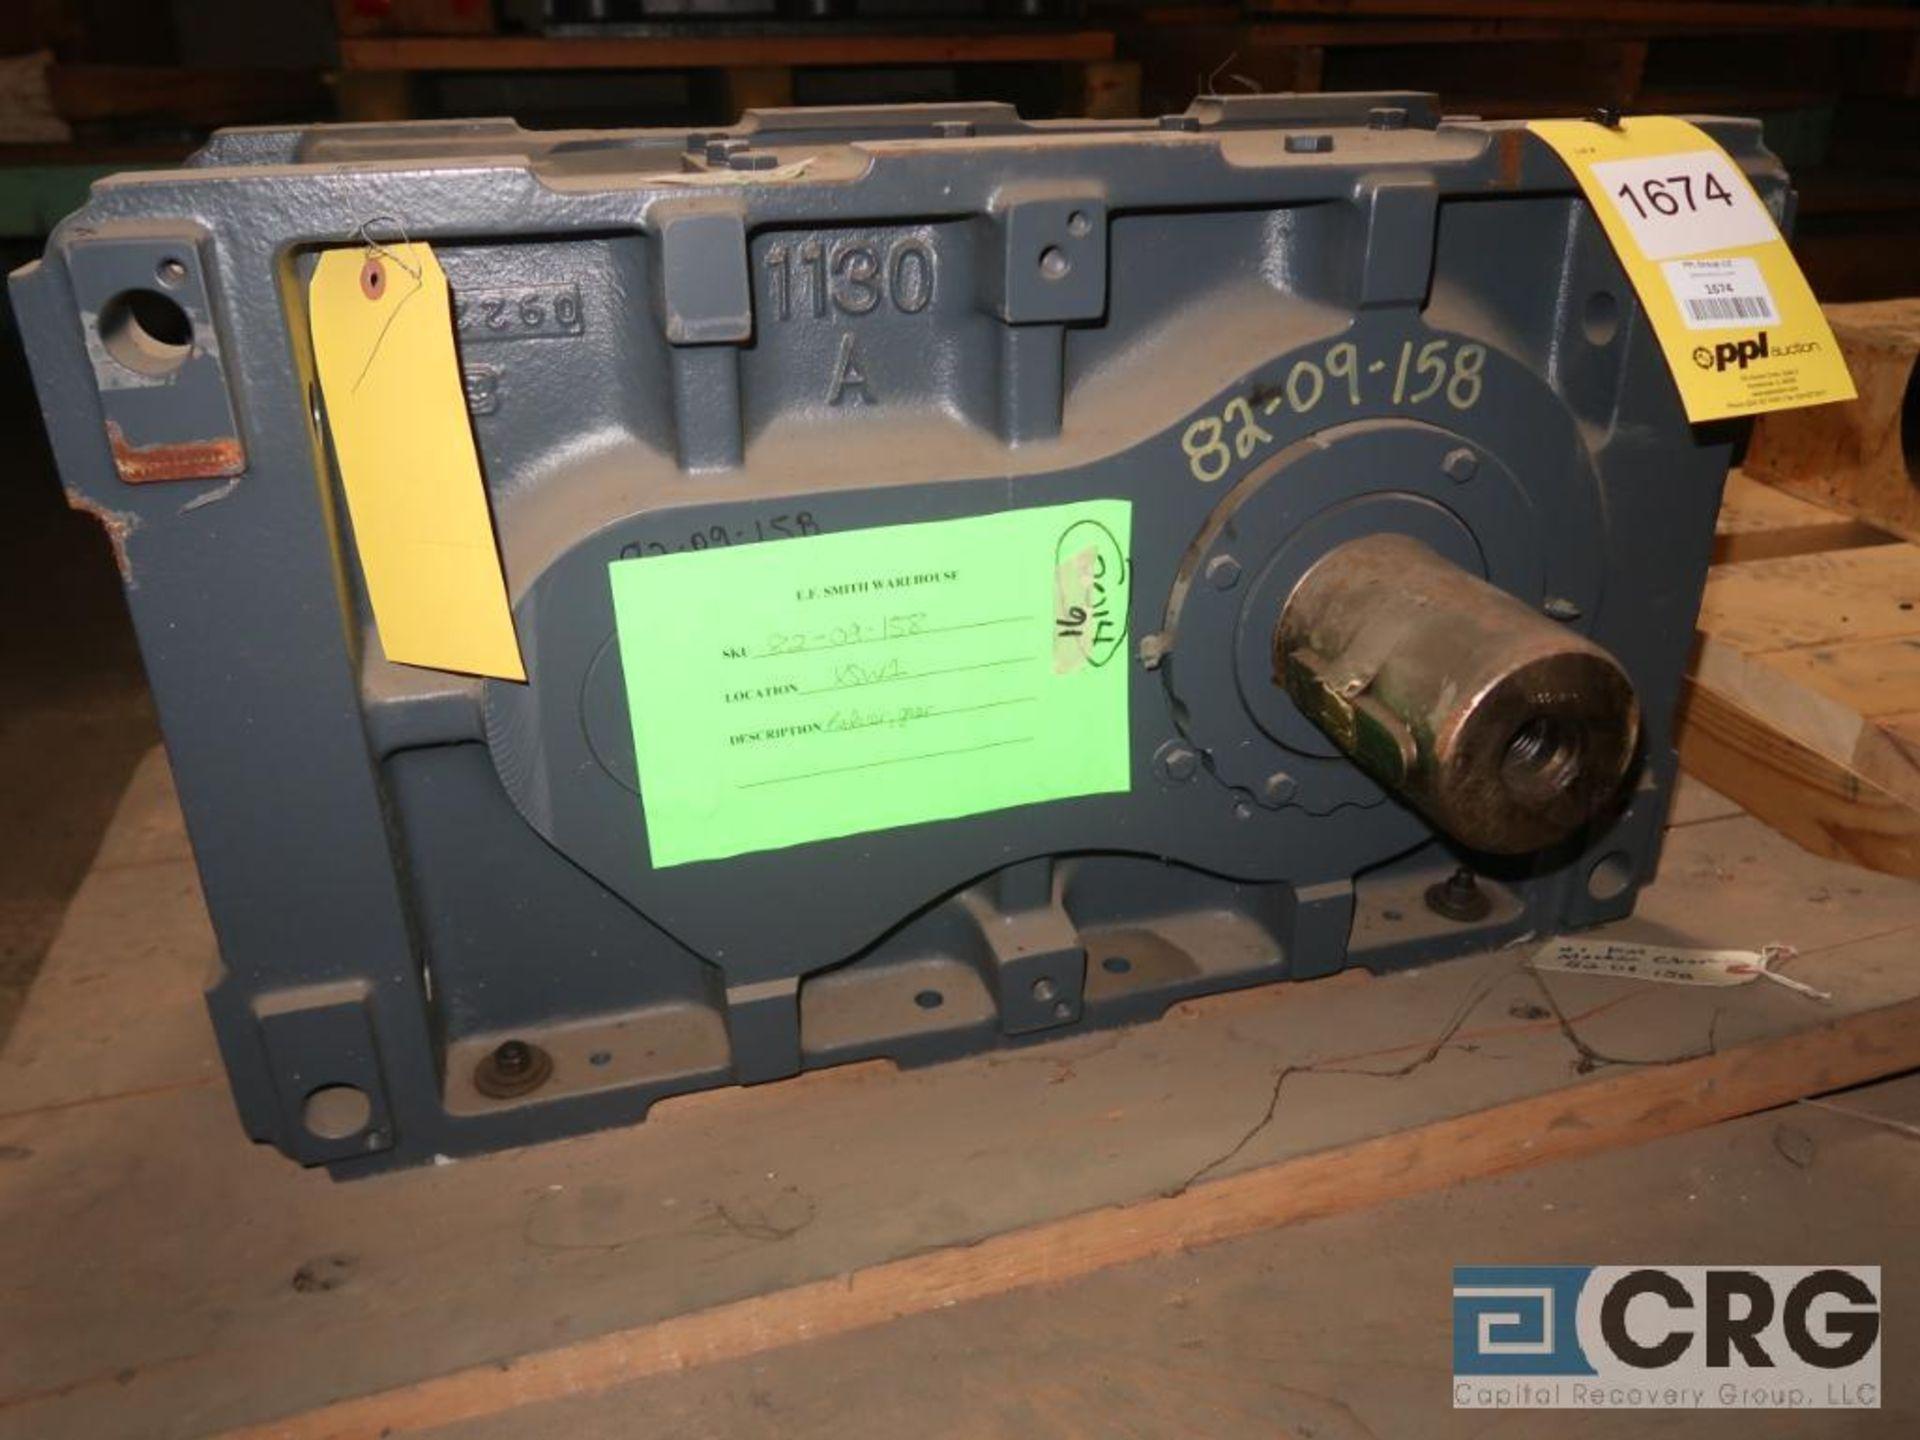 Falk M1130DHC 2A gear drive, ratio-9.932, RPM 1170/117.8, service rate HP. 25, s/n 068444C1 (Next